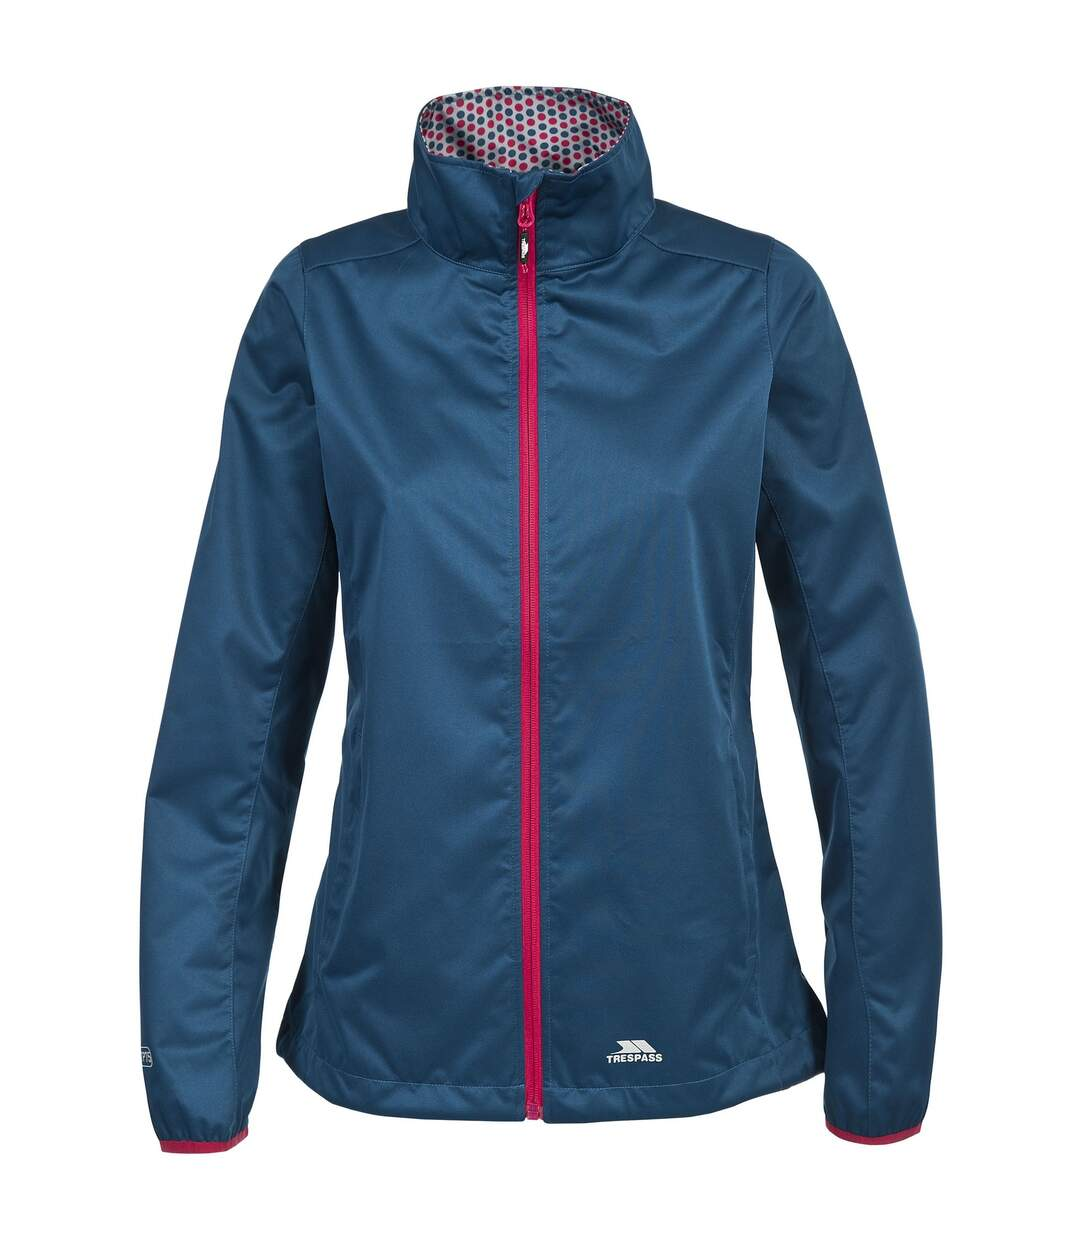 Trespass Womens/Ladies Frieda Waterproof Softshell Jacket (Midnight Blue) - UTTP3500